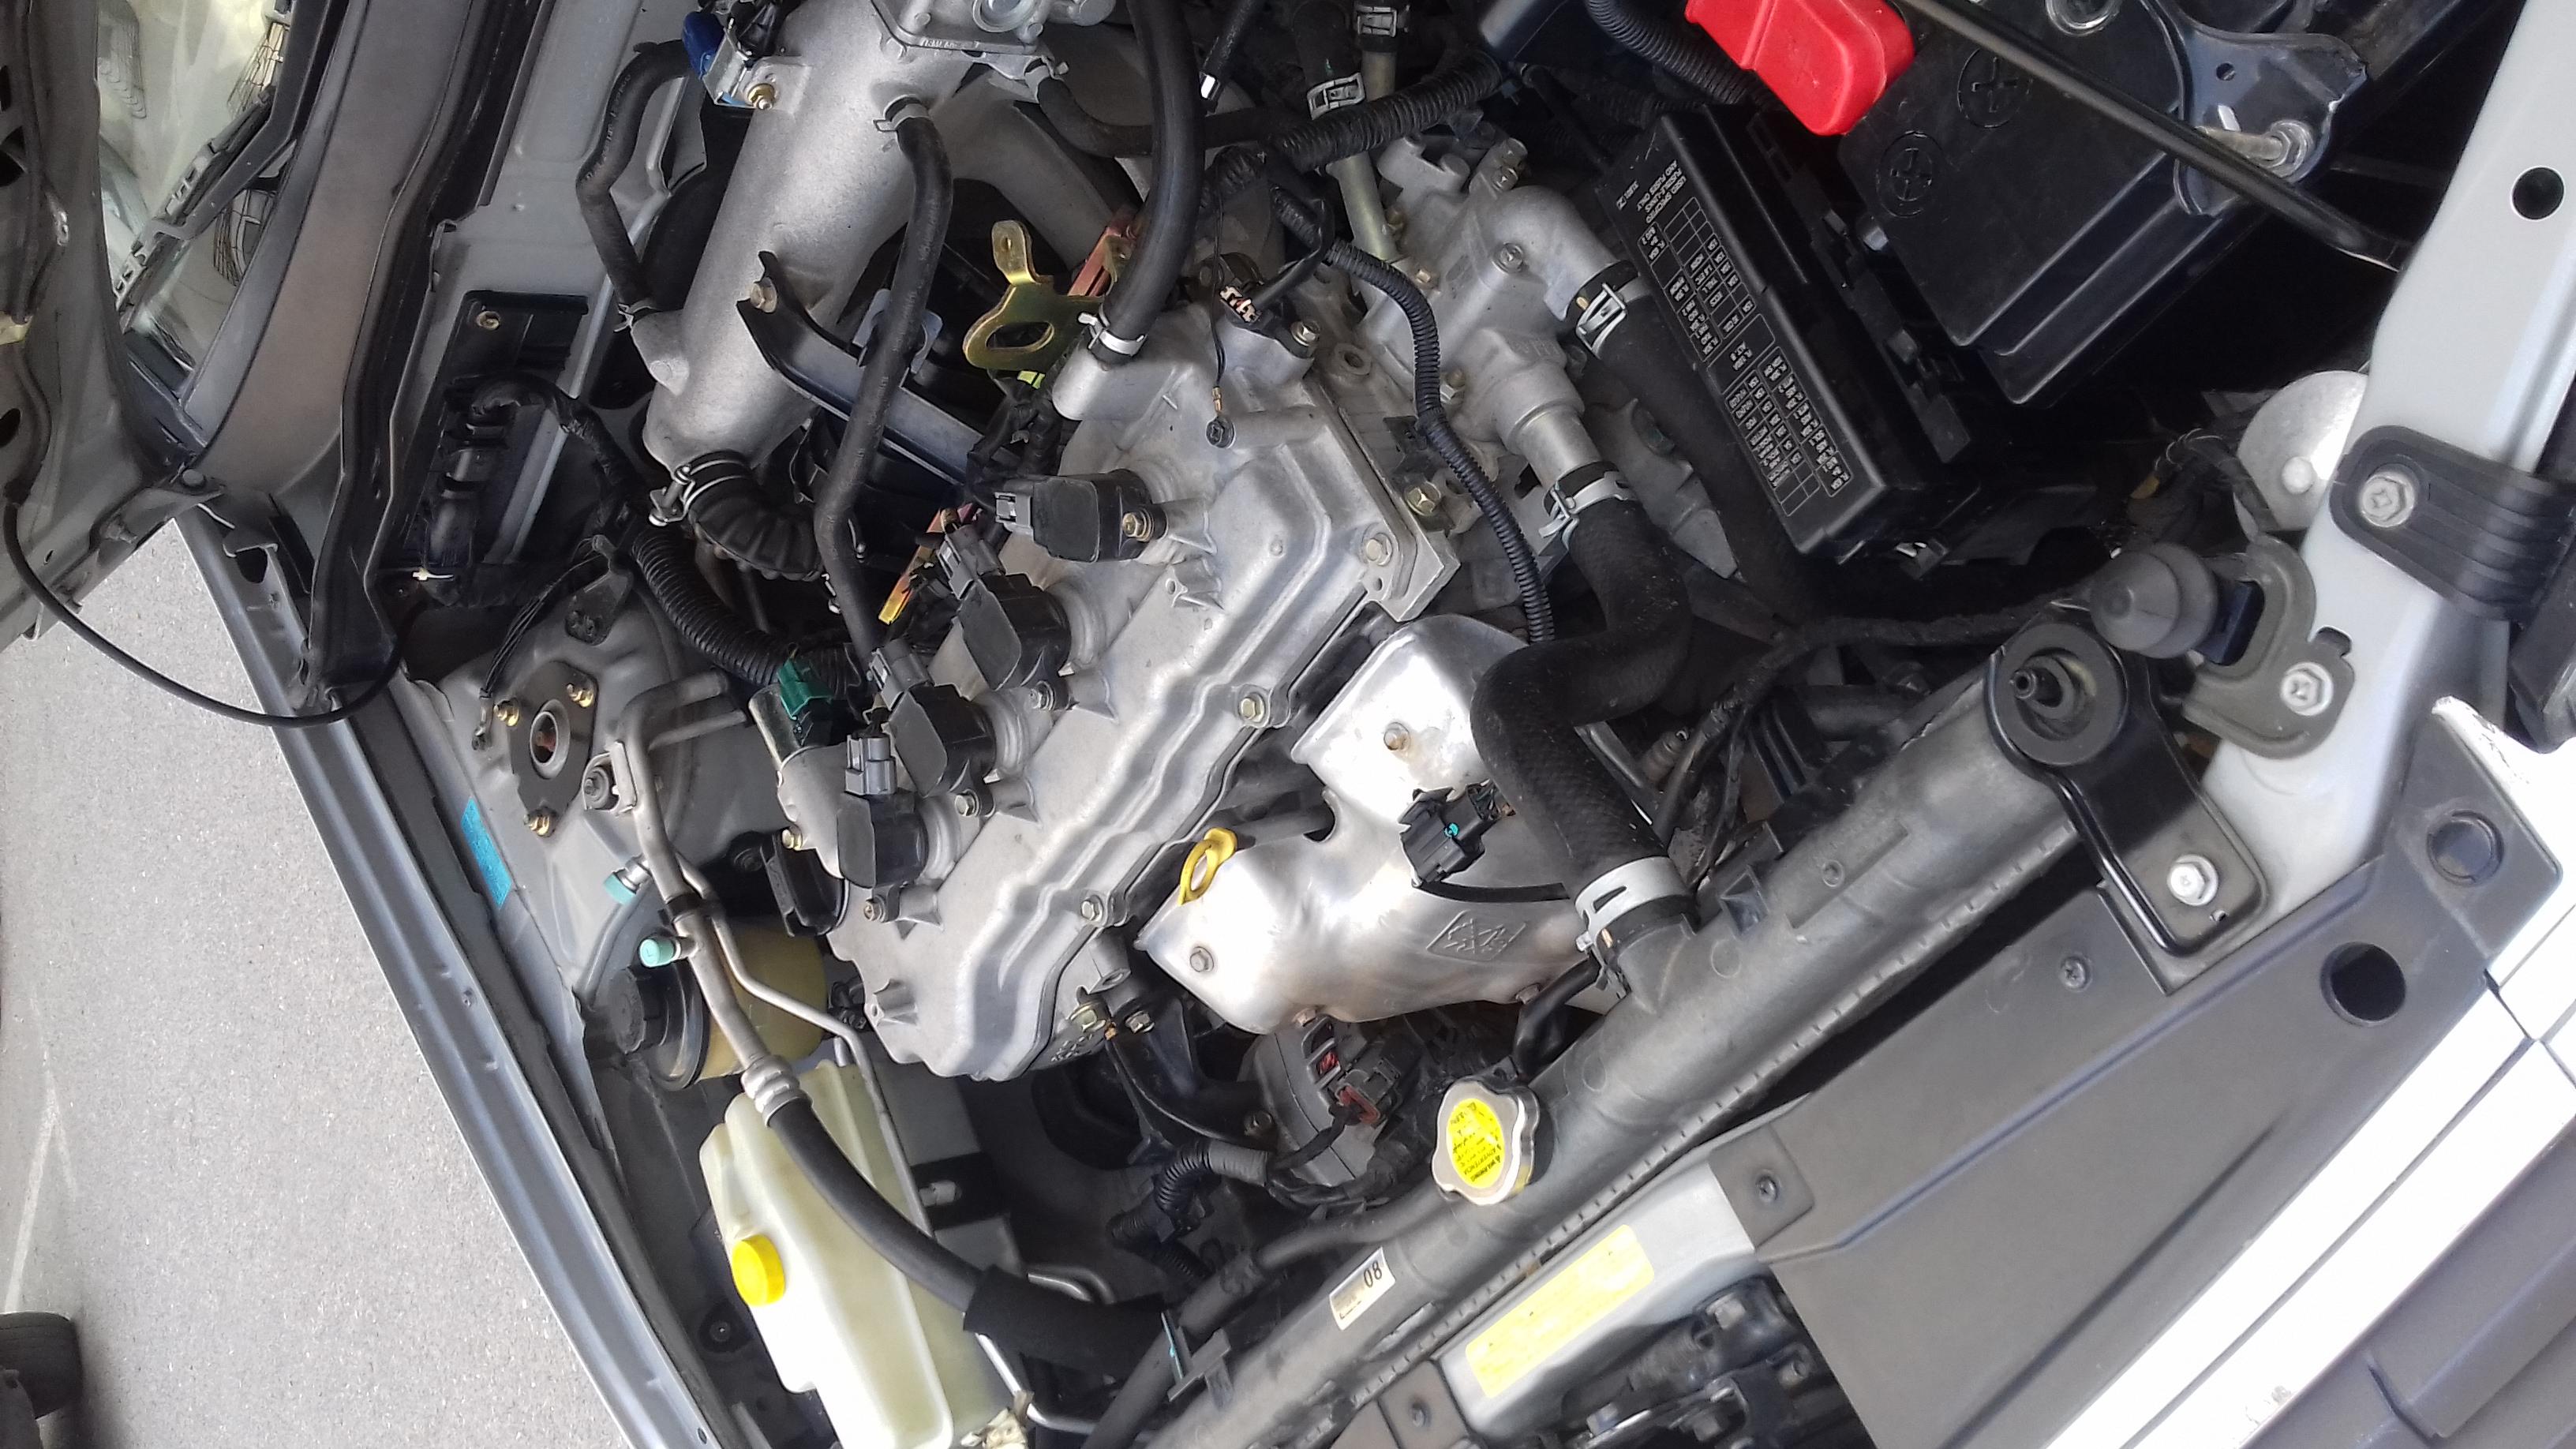 Nissan Sunny 1.6(lt) 2011 İkinci əl  $8000